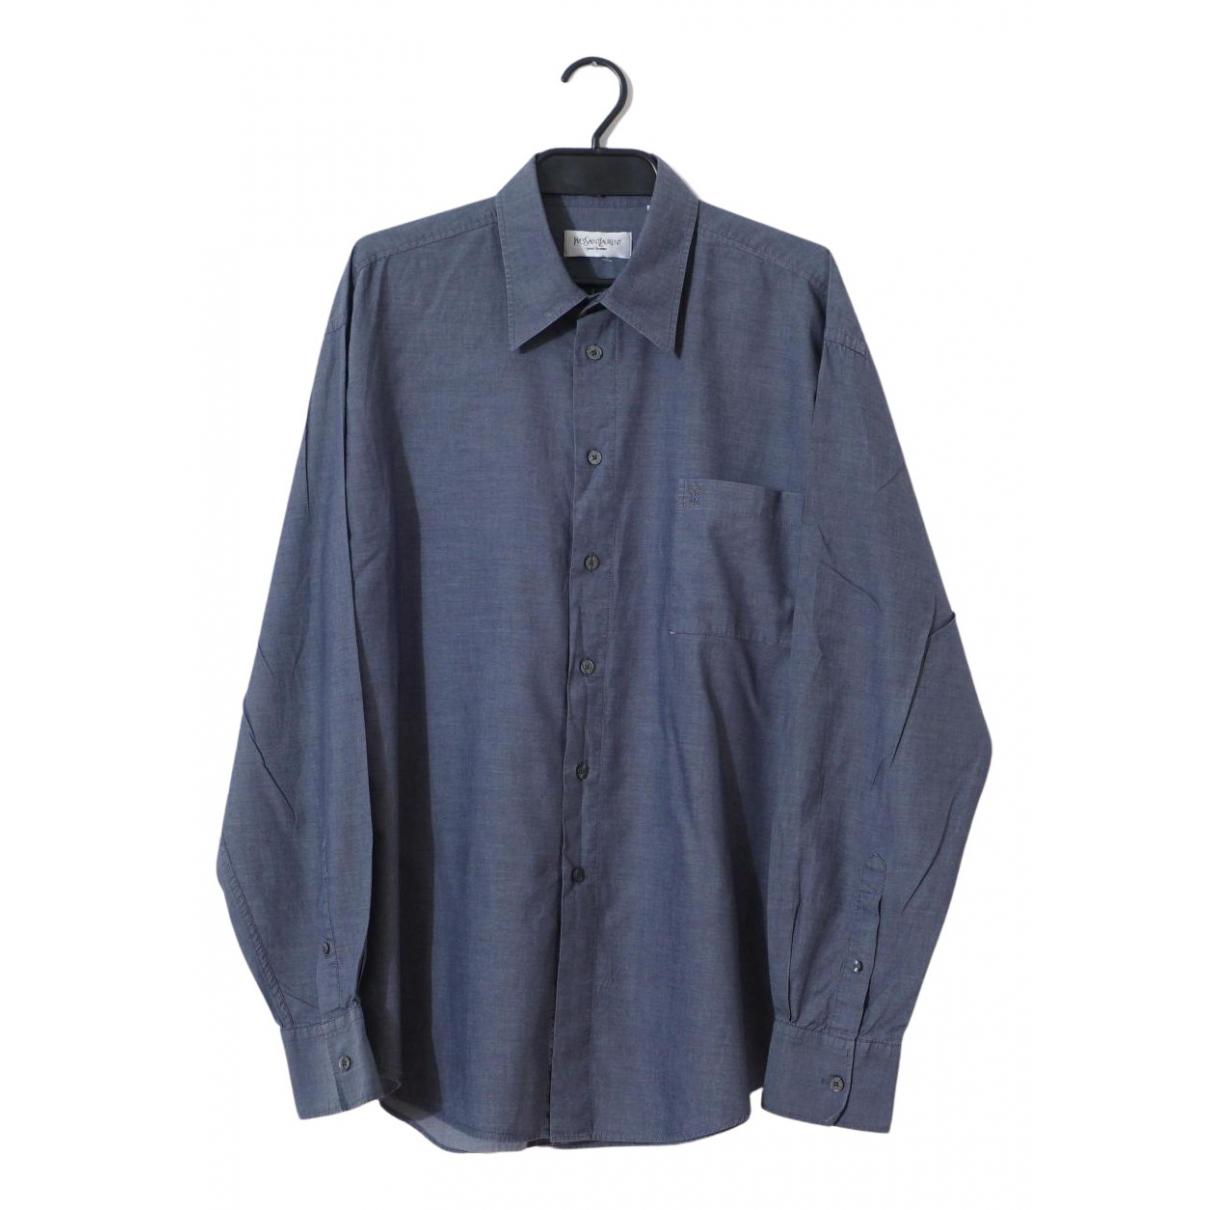 Yves Saint Laurent N Grey Cotton Shirts for Men L International